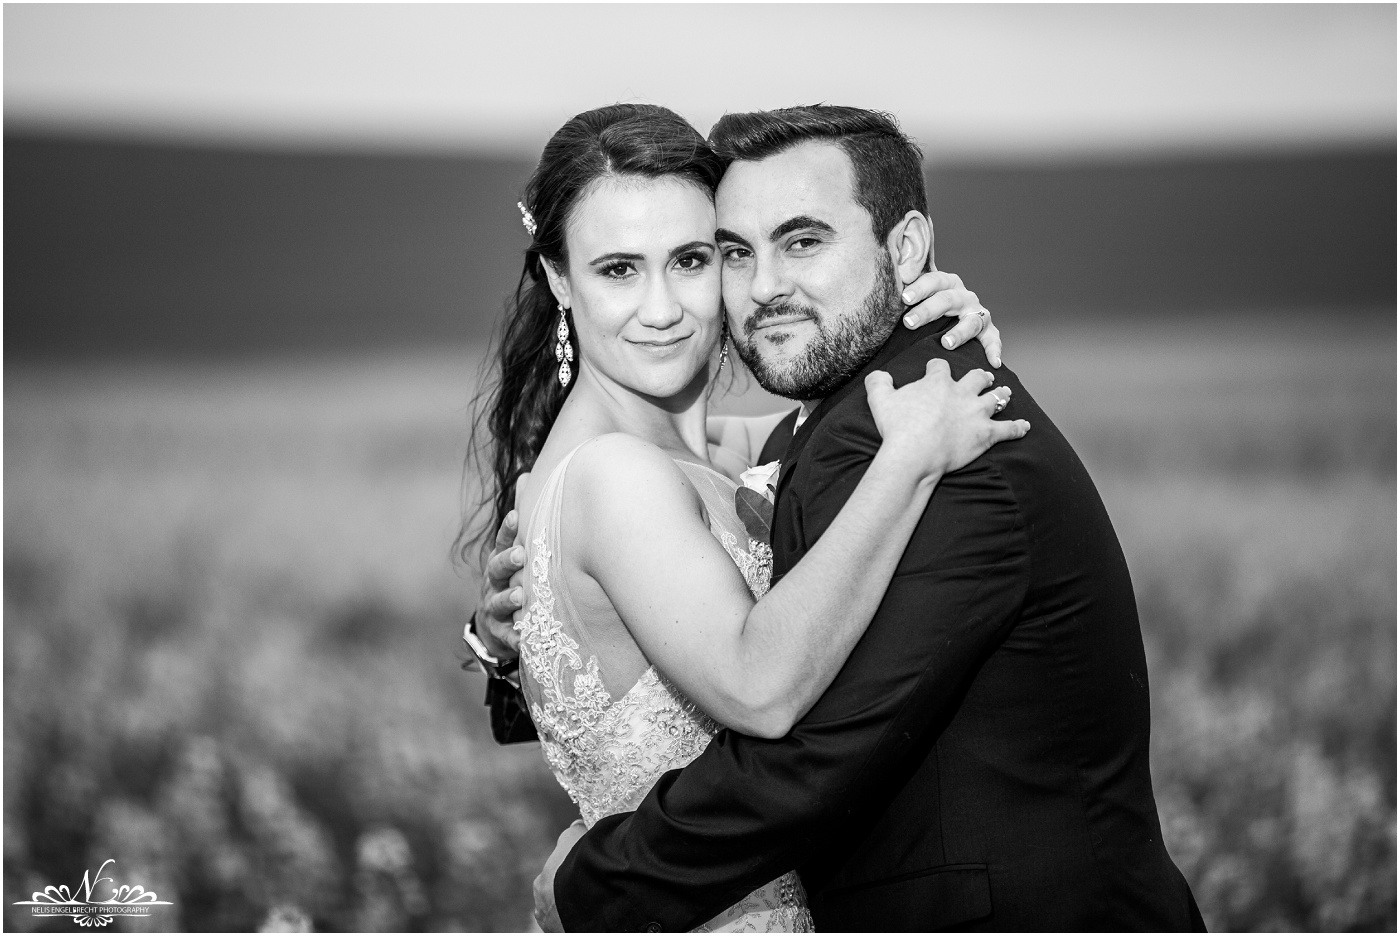 Eensgezind-Wedding-Photos-Nelis-Engelbrecht-Photography-143